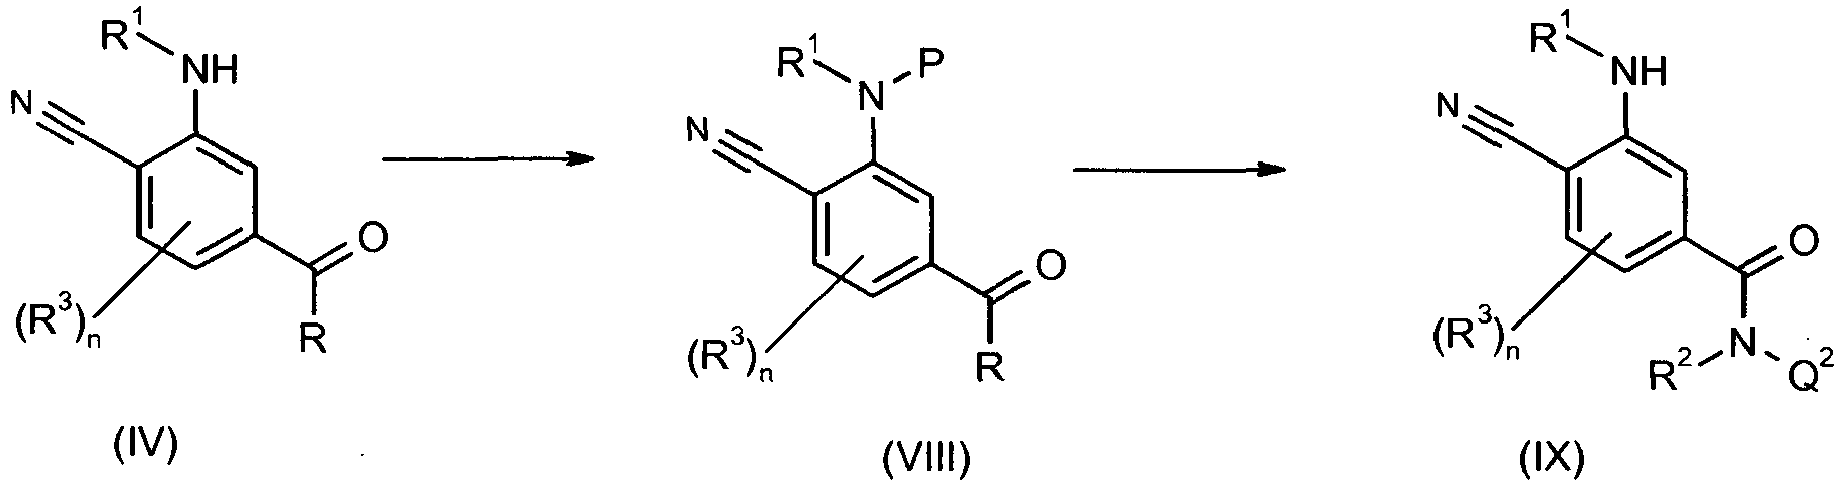 EP2427427B1 - 4-cyano-3-benzoylamino-n-phenyl-benzamides for